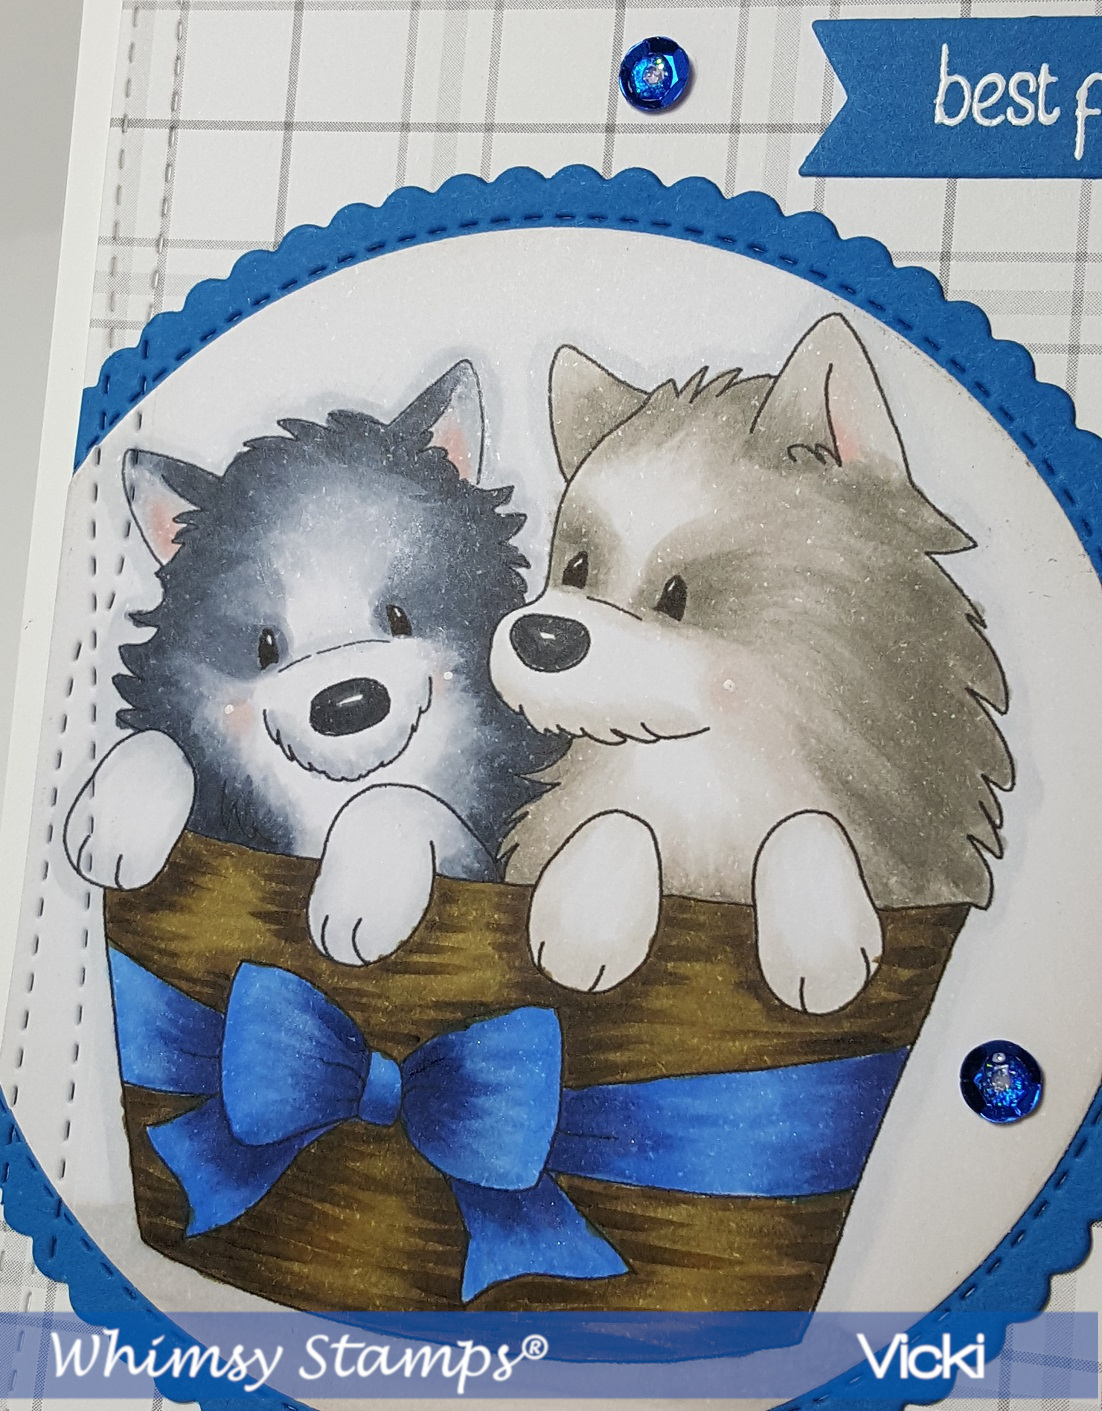 Vicki-WS-Aug14-pups up close